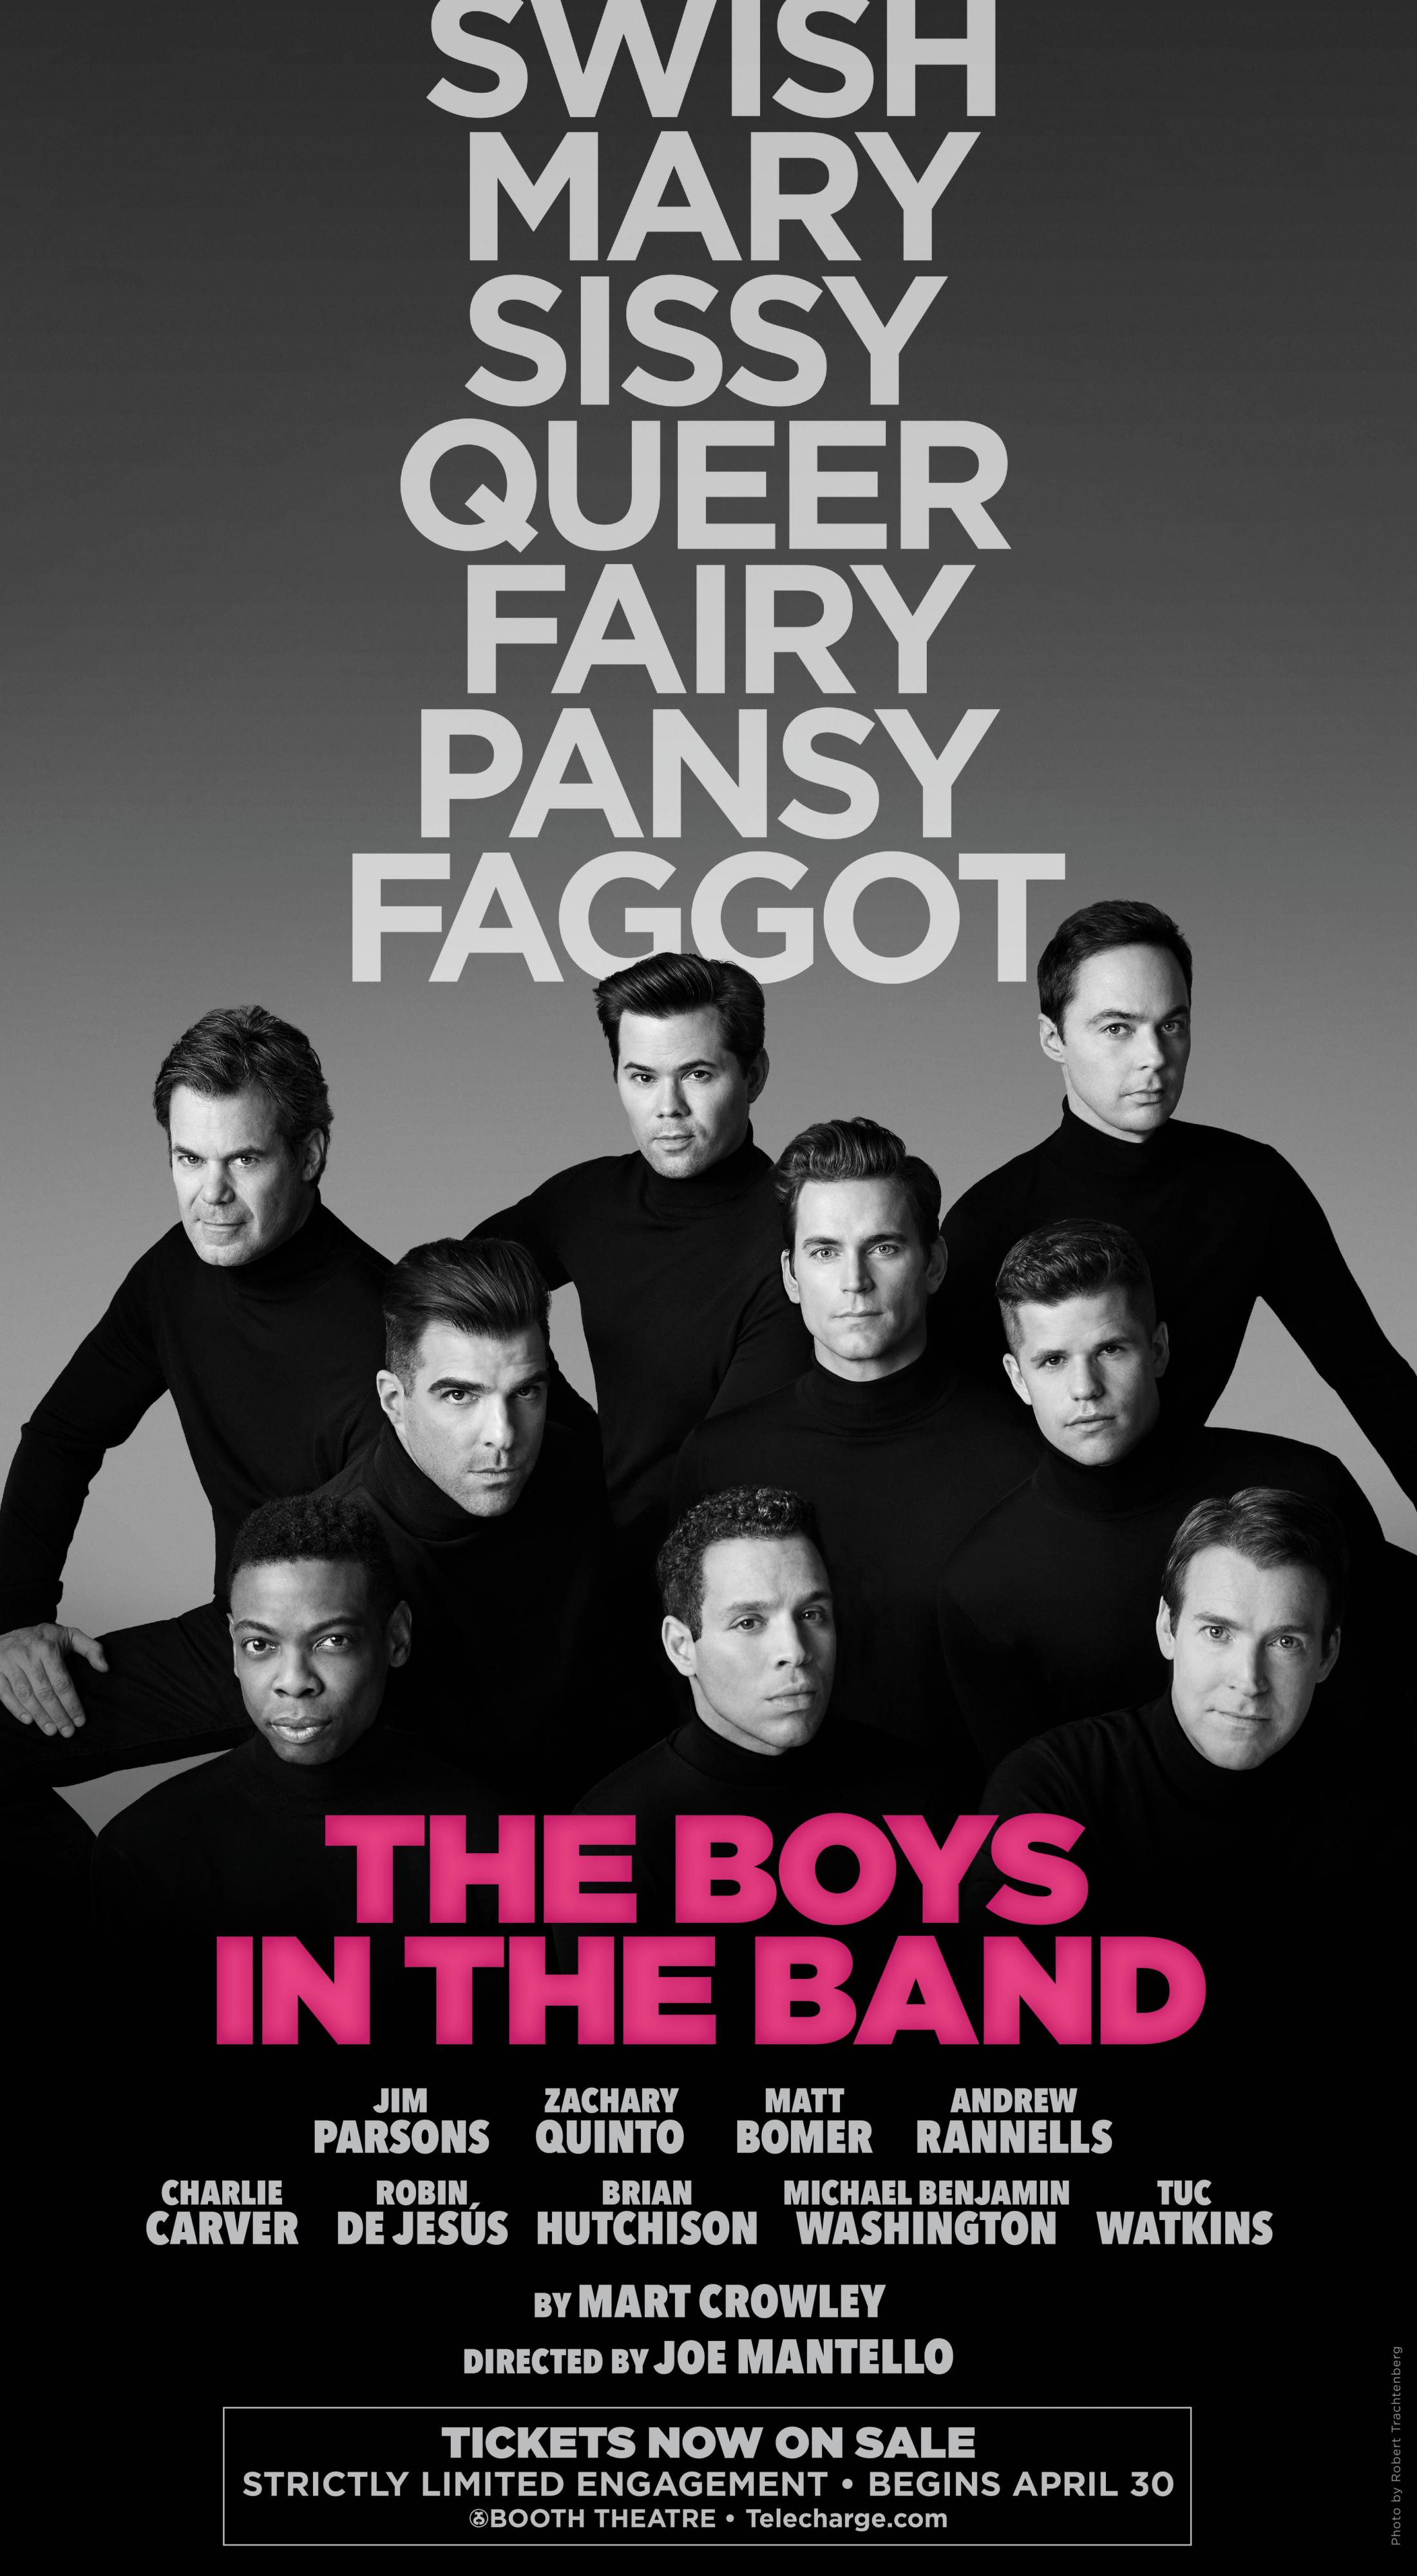 Thumbnail for Swish. Mary. Sissy. Queer. Fairy. Faggot. Boys.